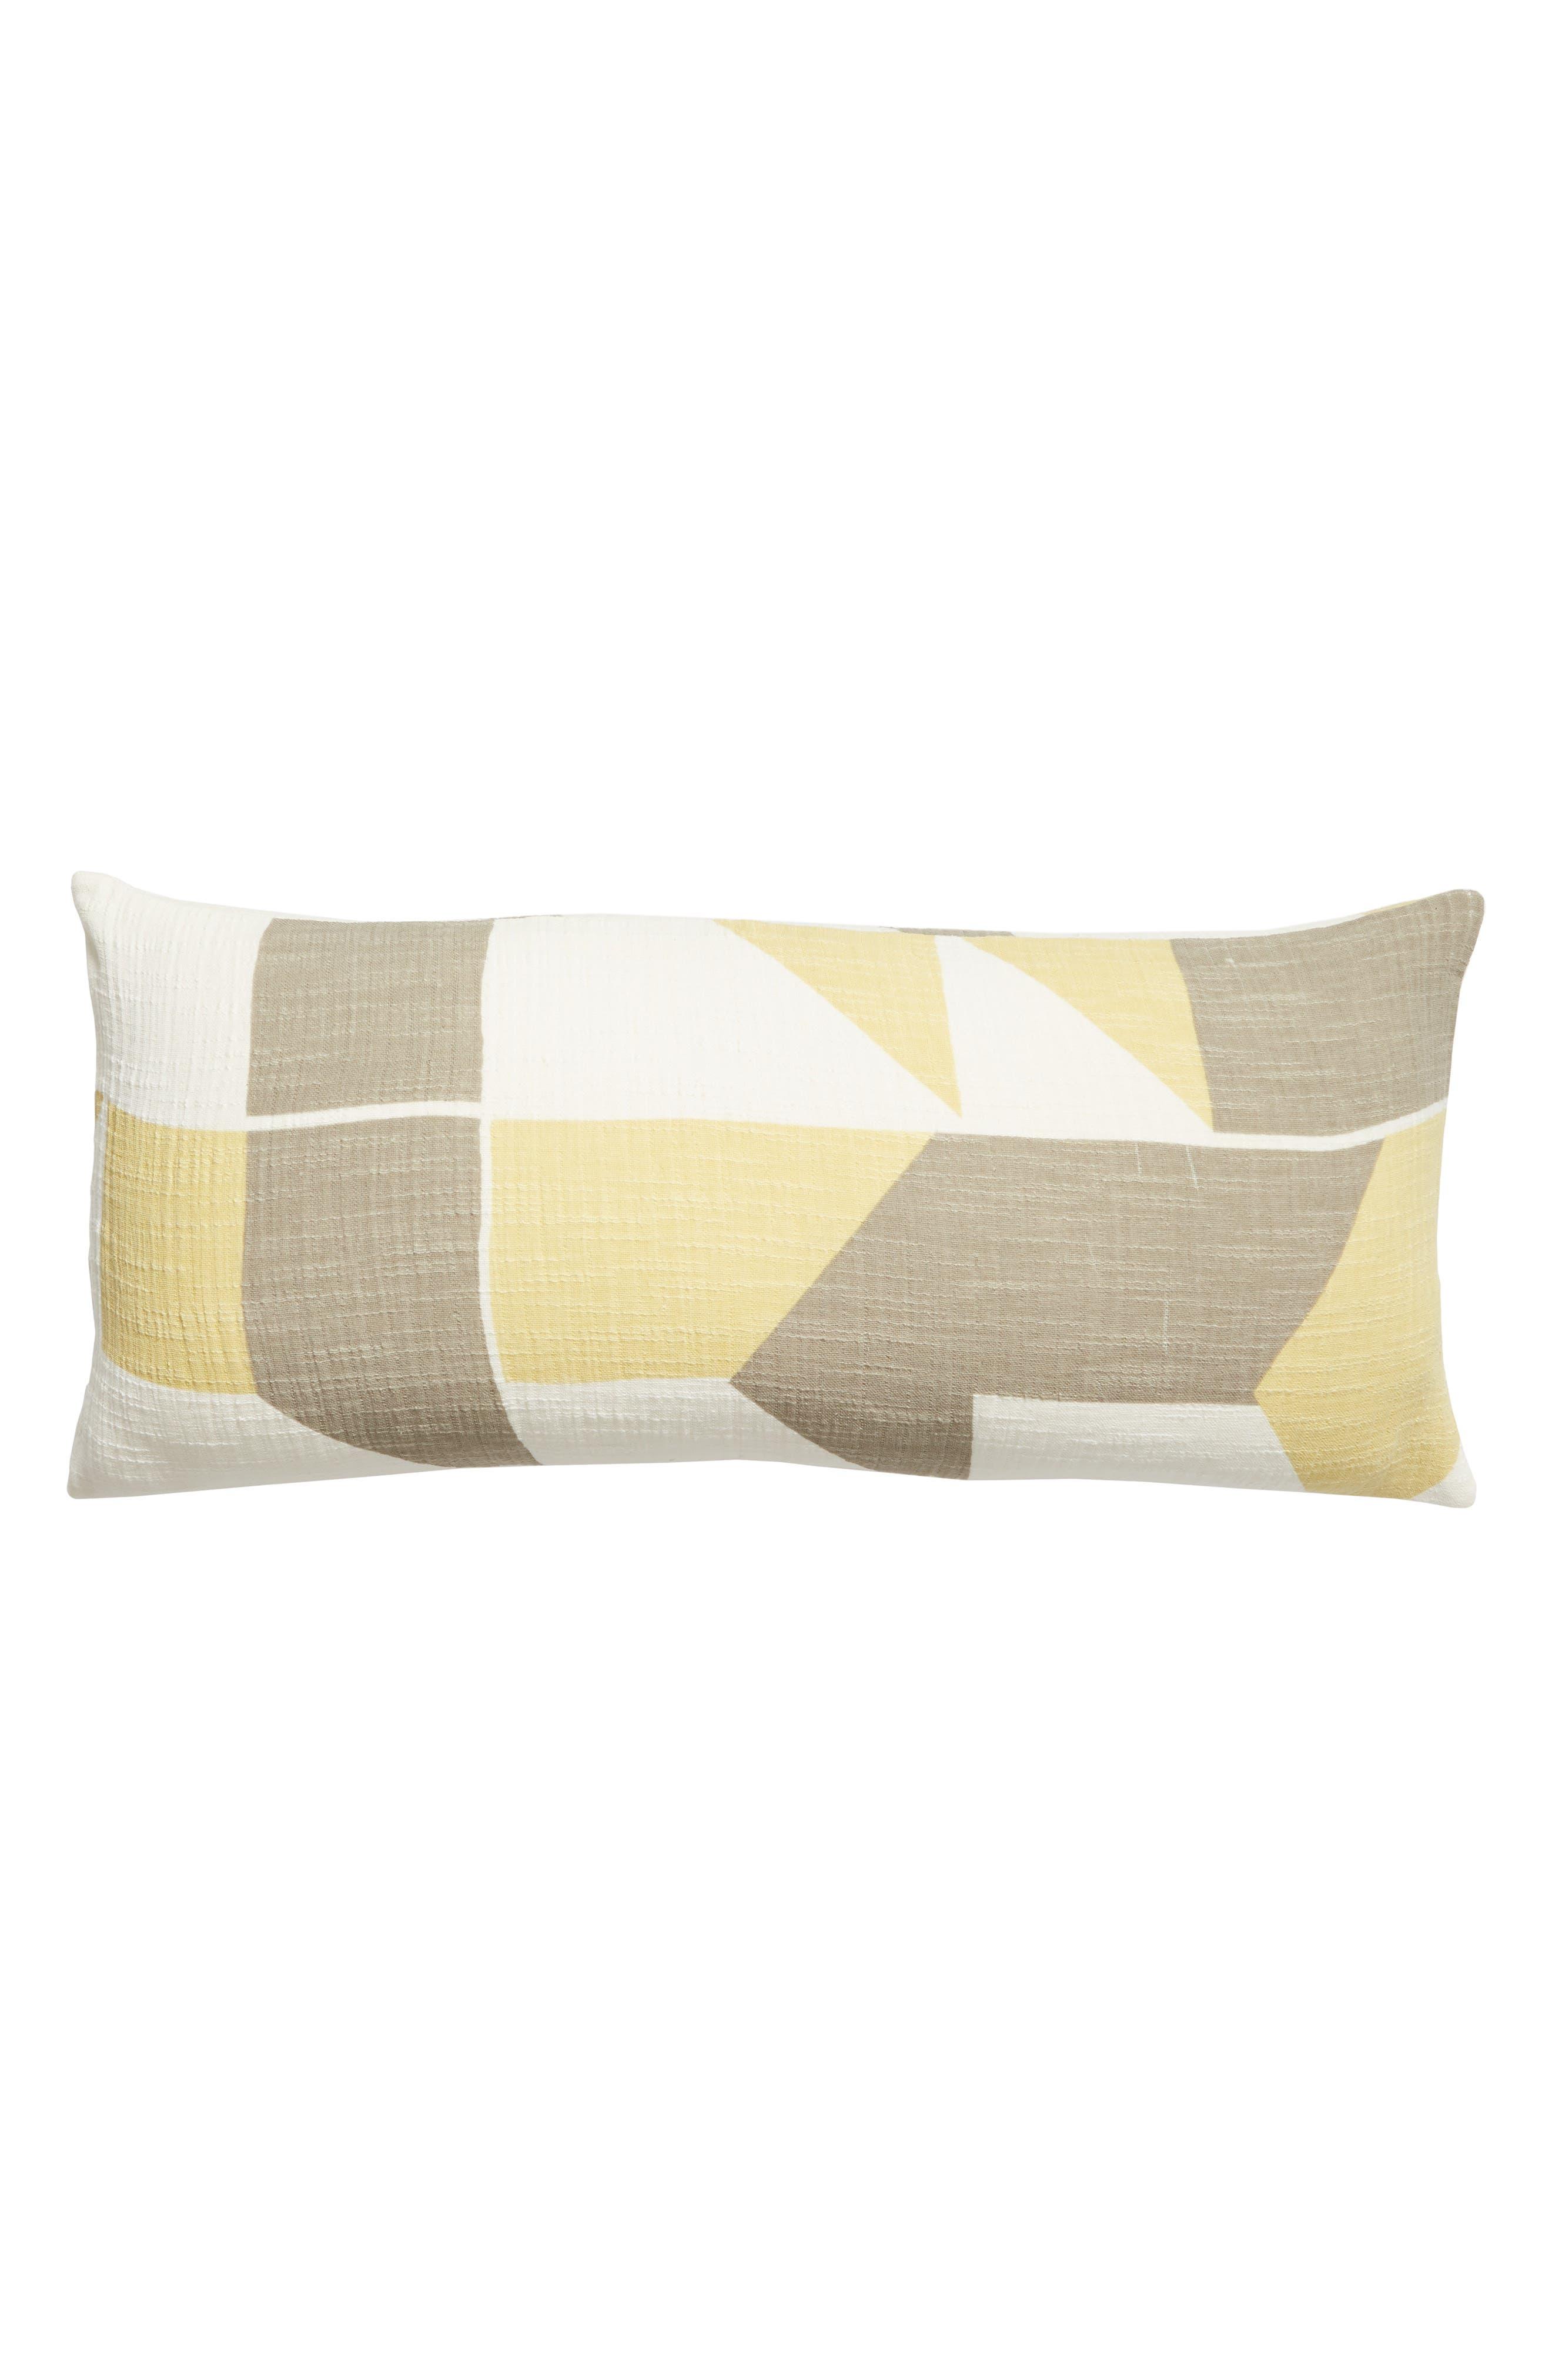 TREASURE & BOND Print Accent Pillow, Main, color, OLIVE NILE MULTI